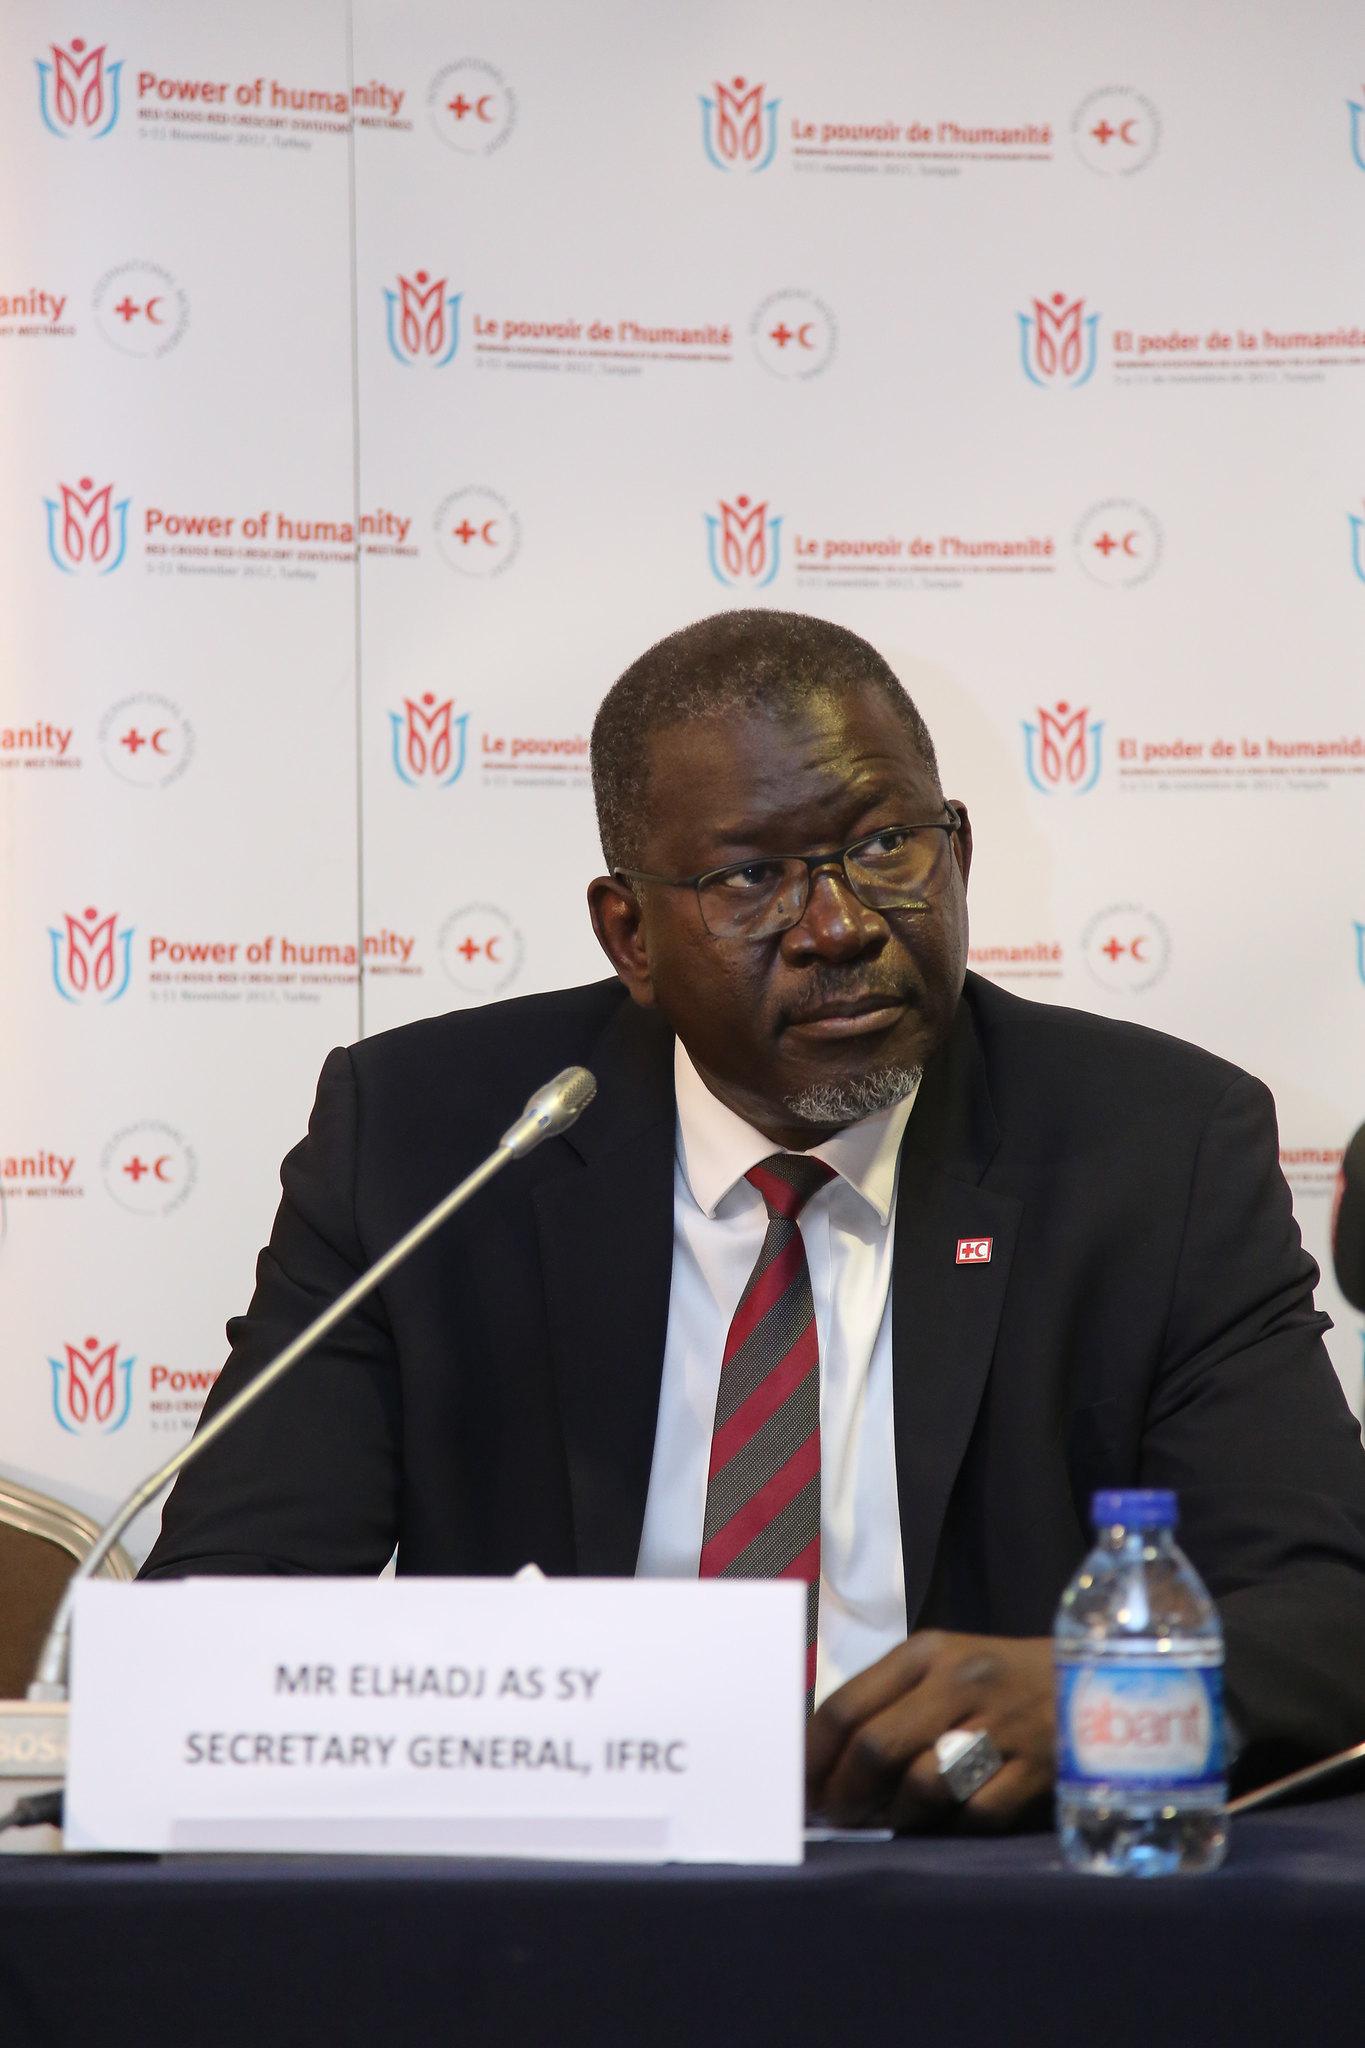 IFRC Genel Sekreteri Elhadj As Sy